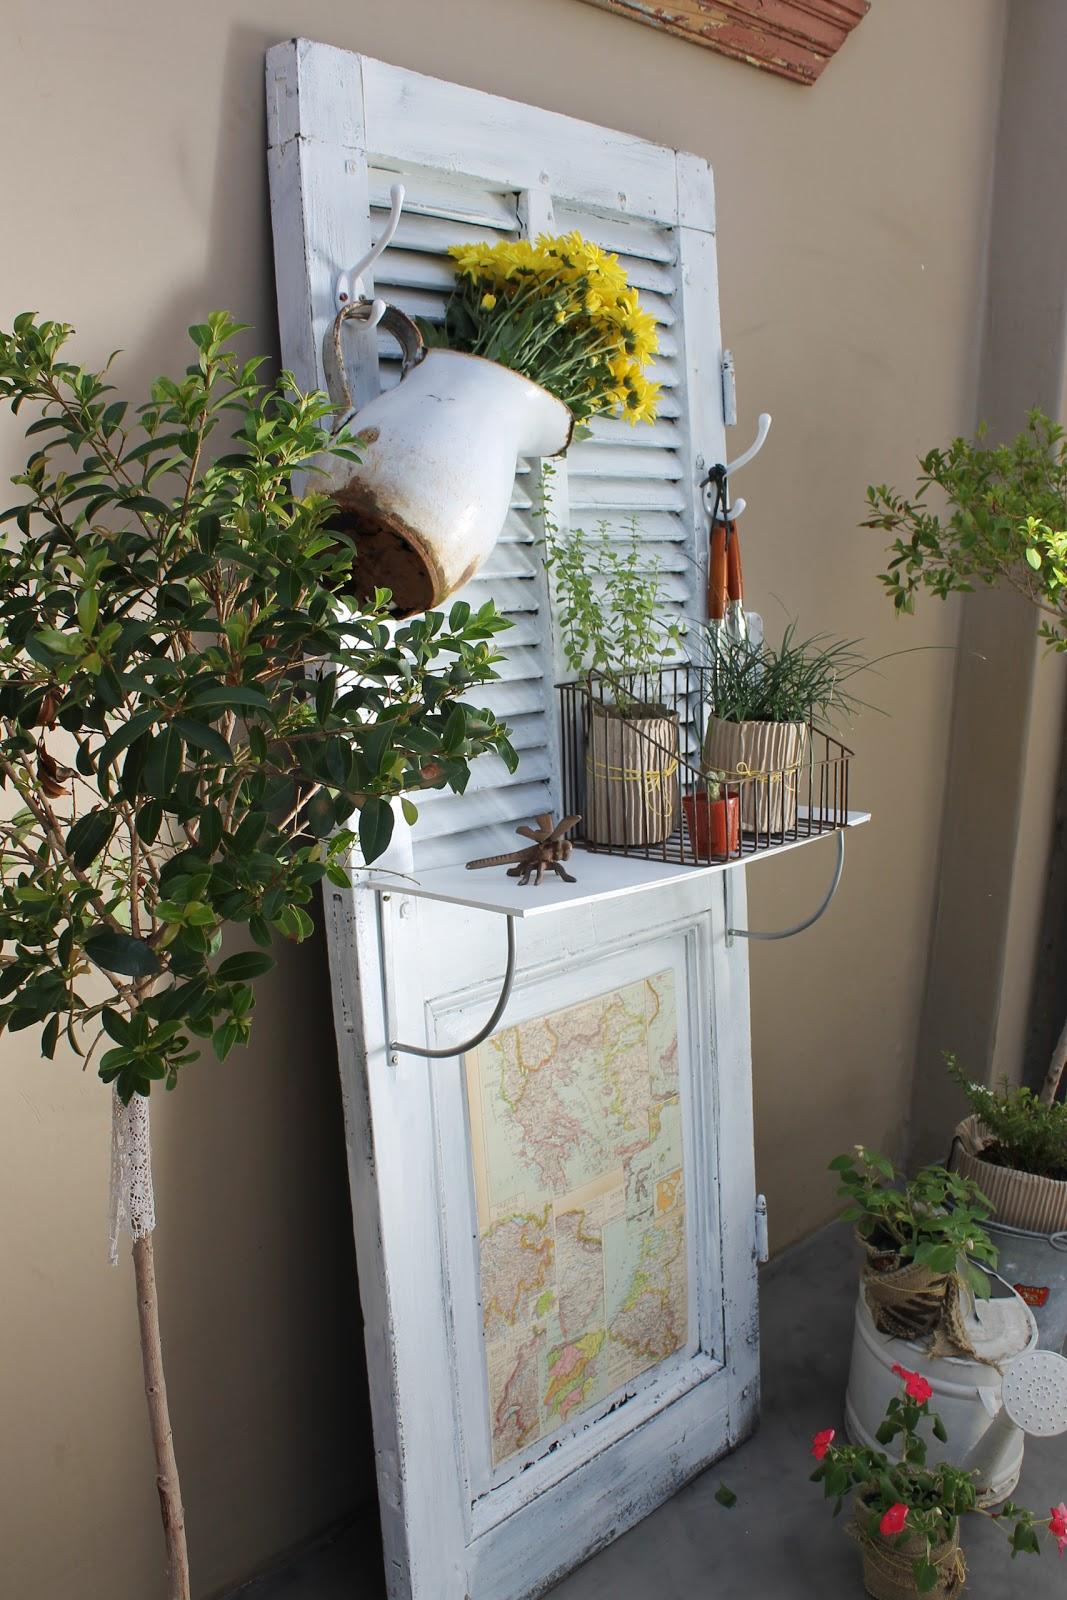 Colaboraci n programa jardineras util sima deco marce for Utilisima jardineria